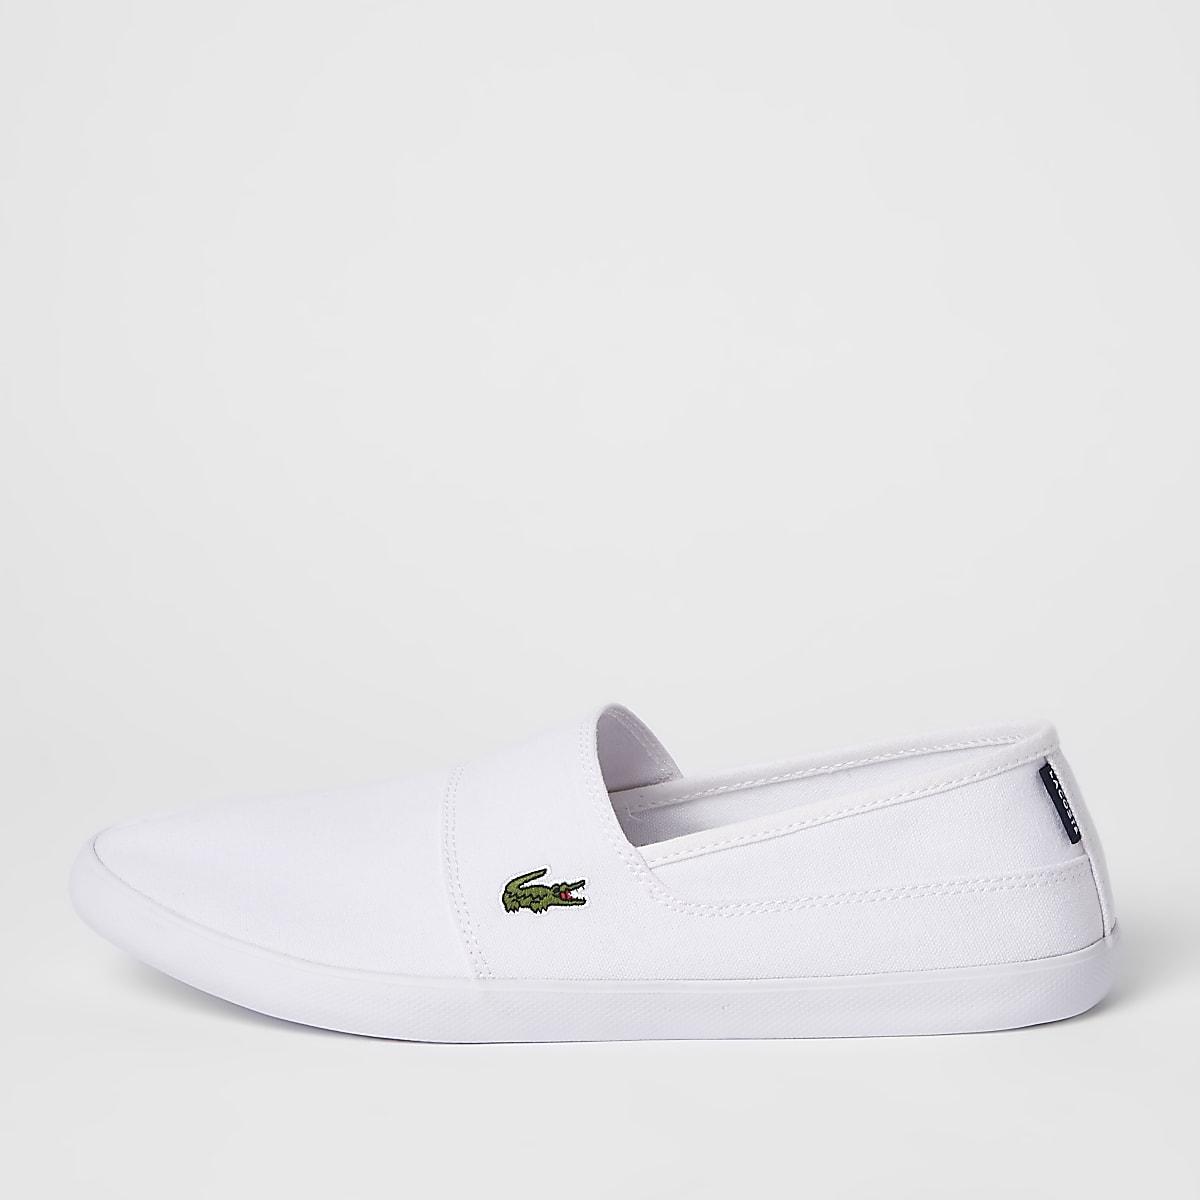 Lacoste – Baskets blanches à enfiler